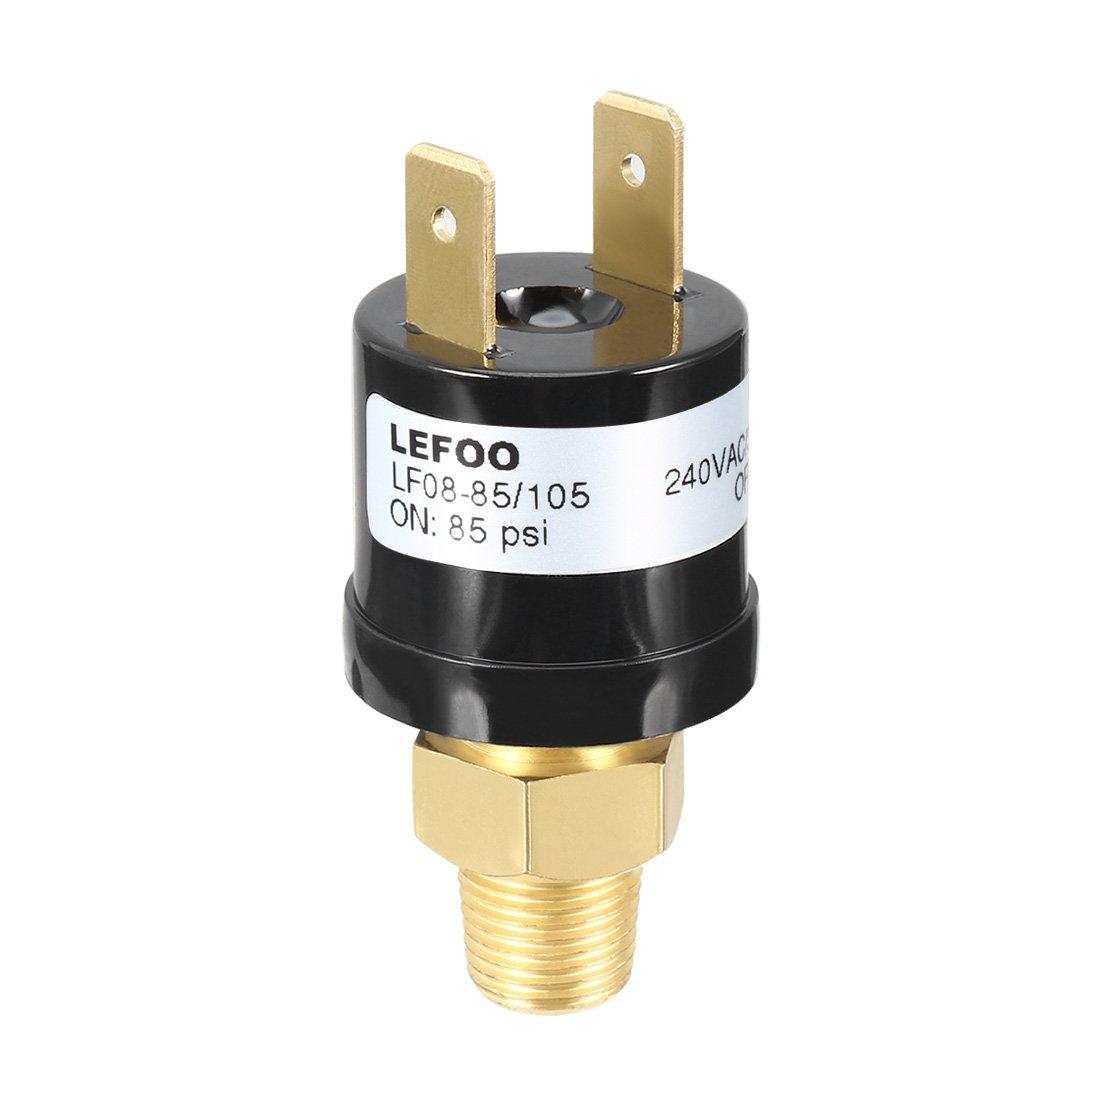 sourcingmap AC240V 3A SPST NC Compressore Aria Pressione interruttore controllo 85/105 psi 2 terminale sourcing map a17061300ux0085